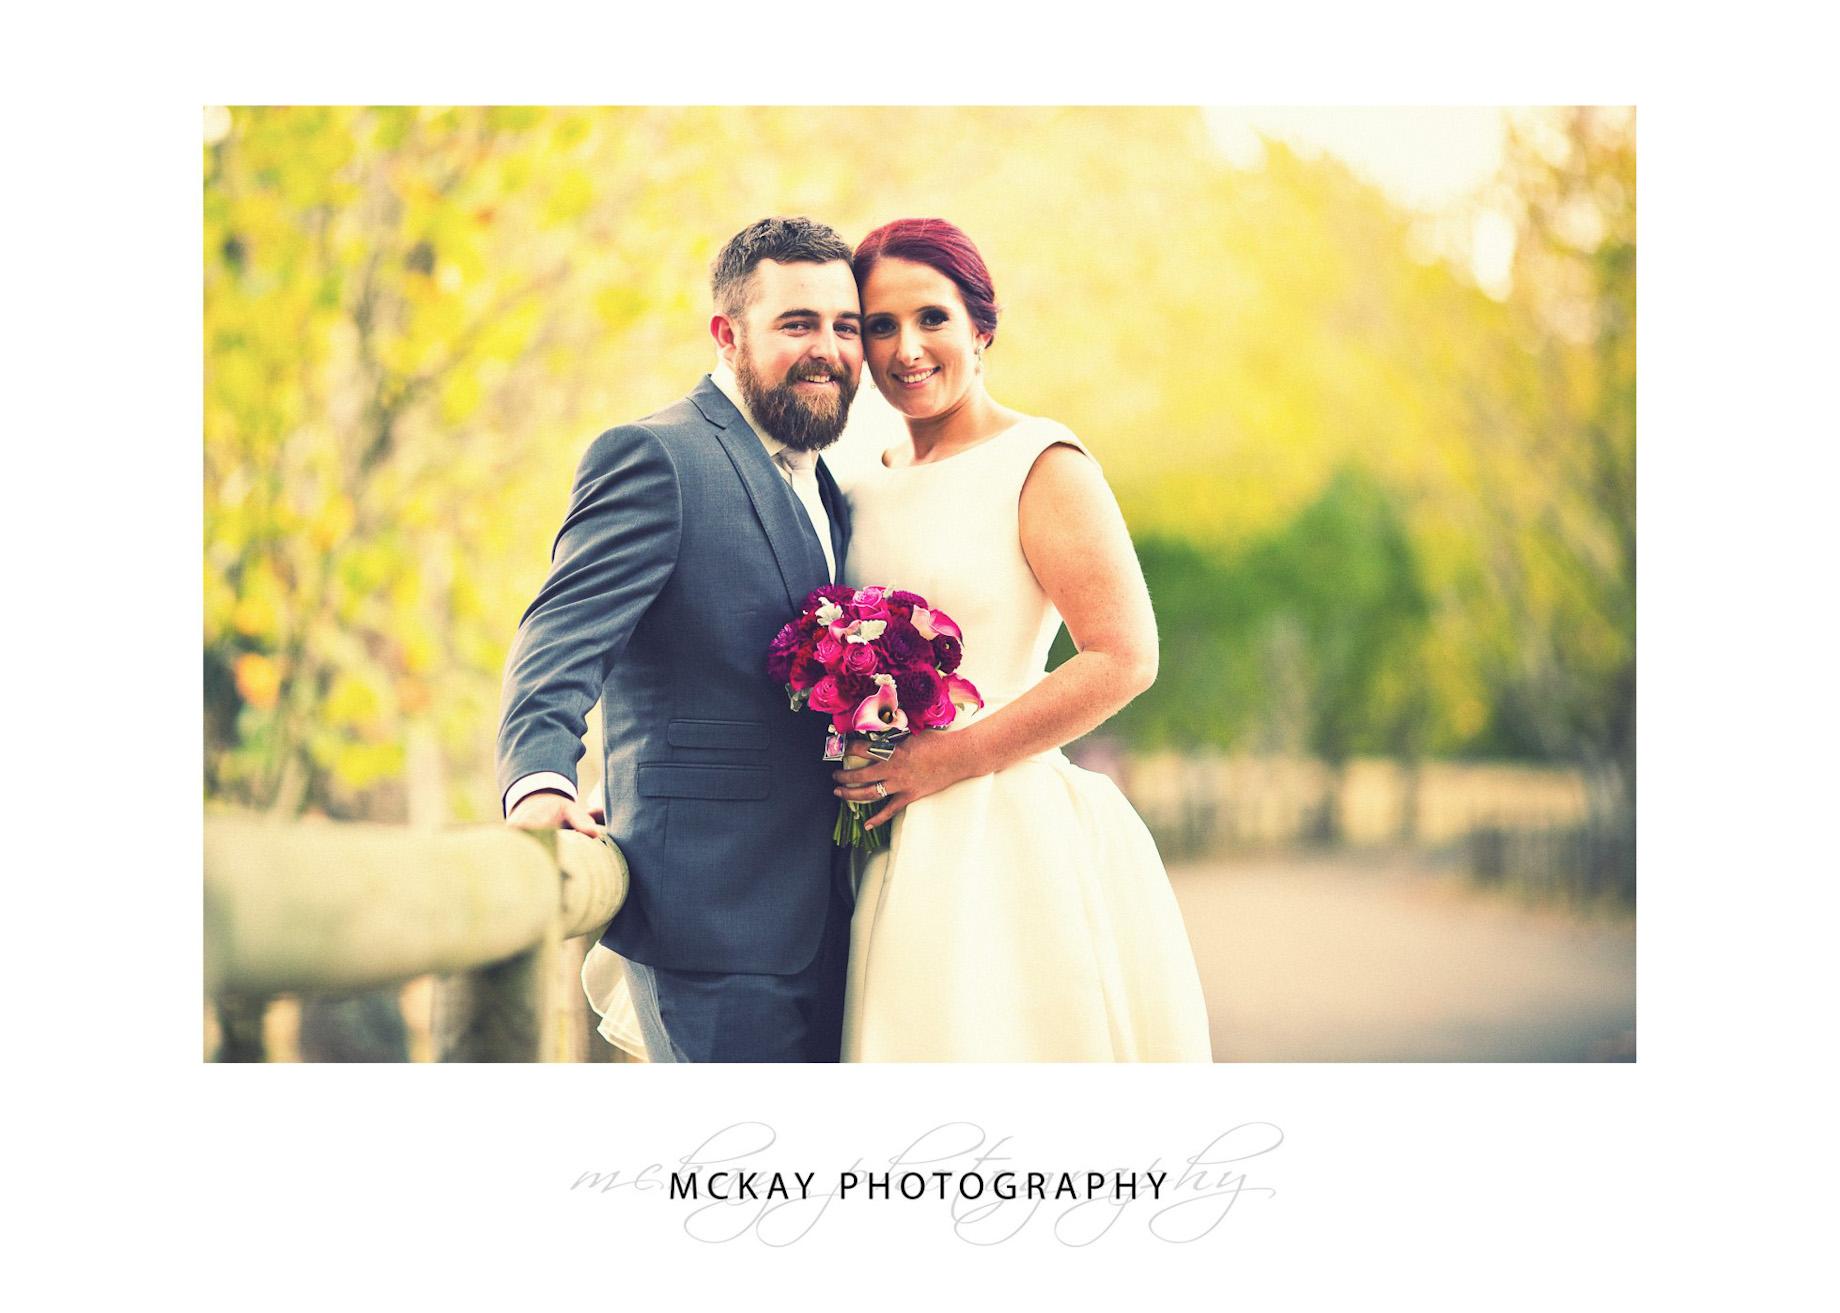 Emma & Corey wedding at Chevalier College Bowral